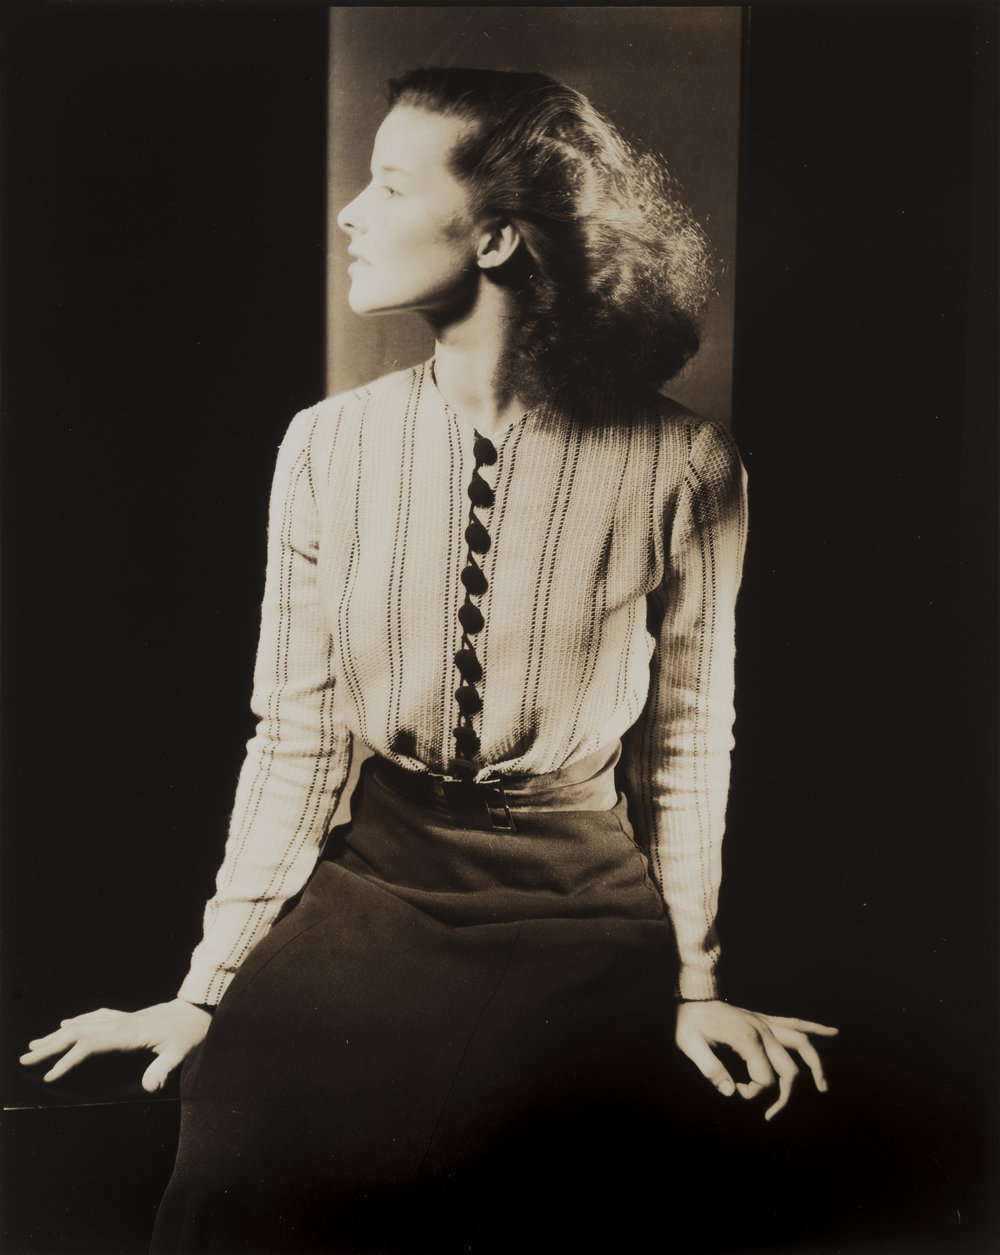 Katherine Hepburn, 1920s